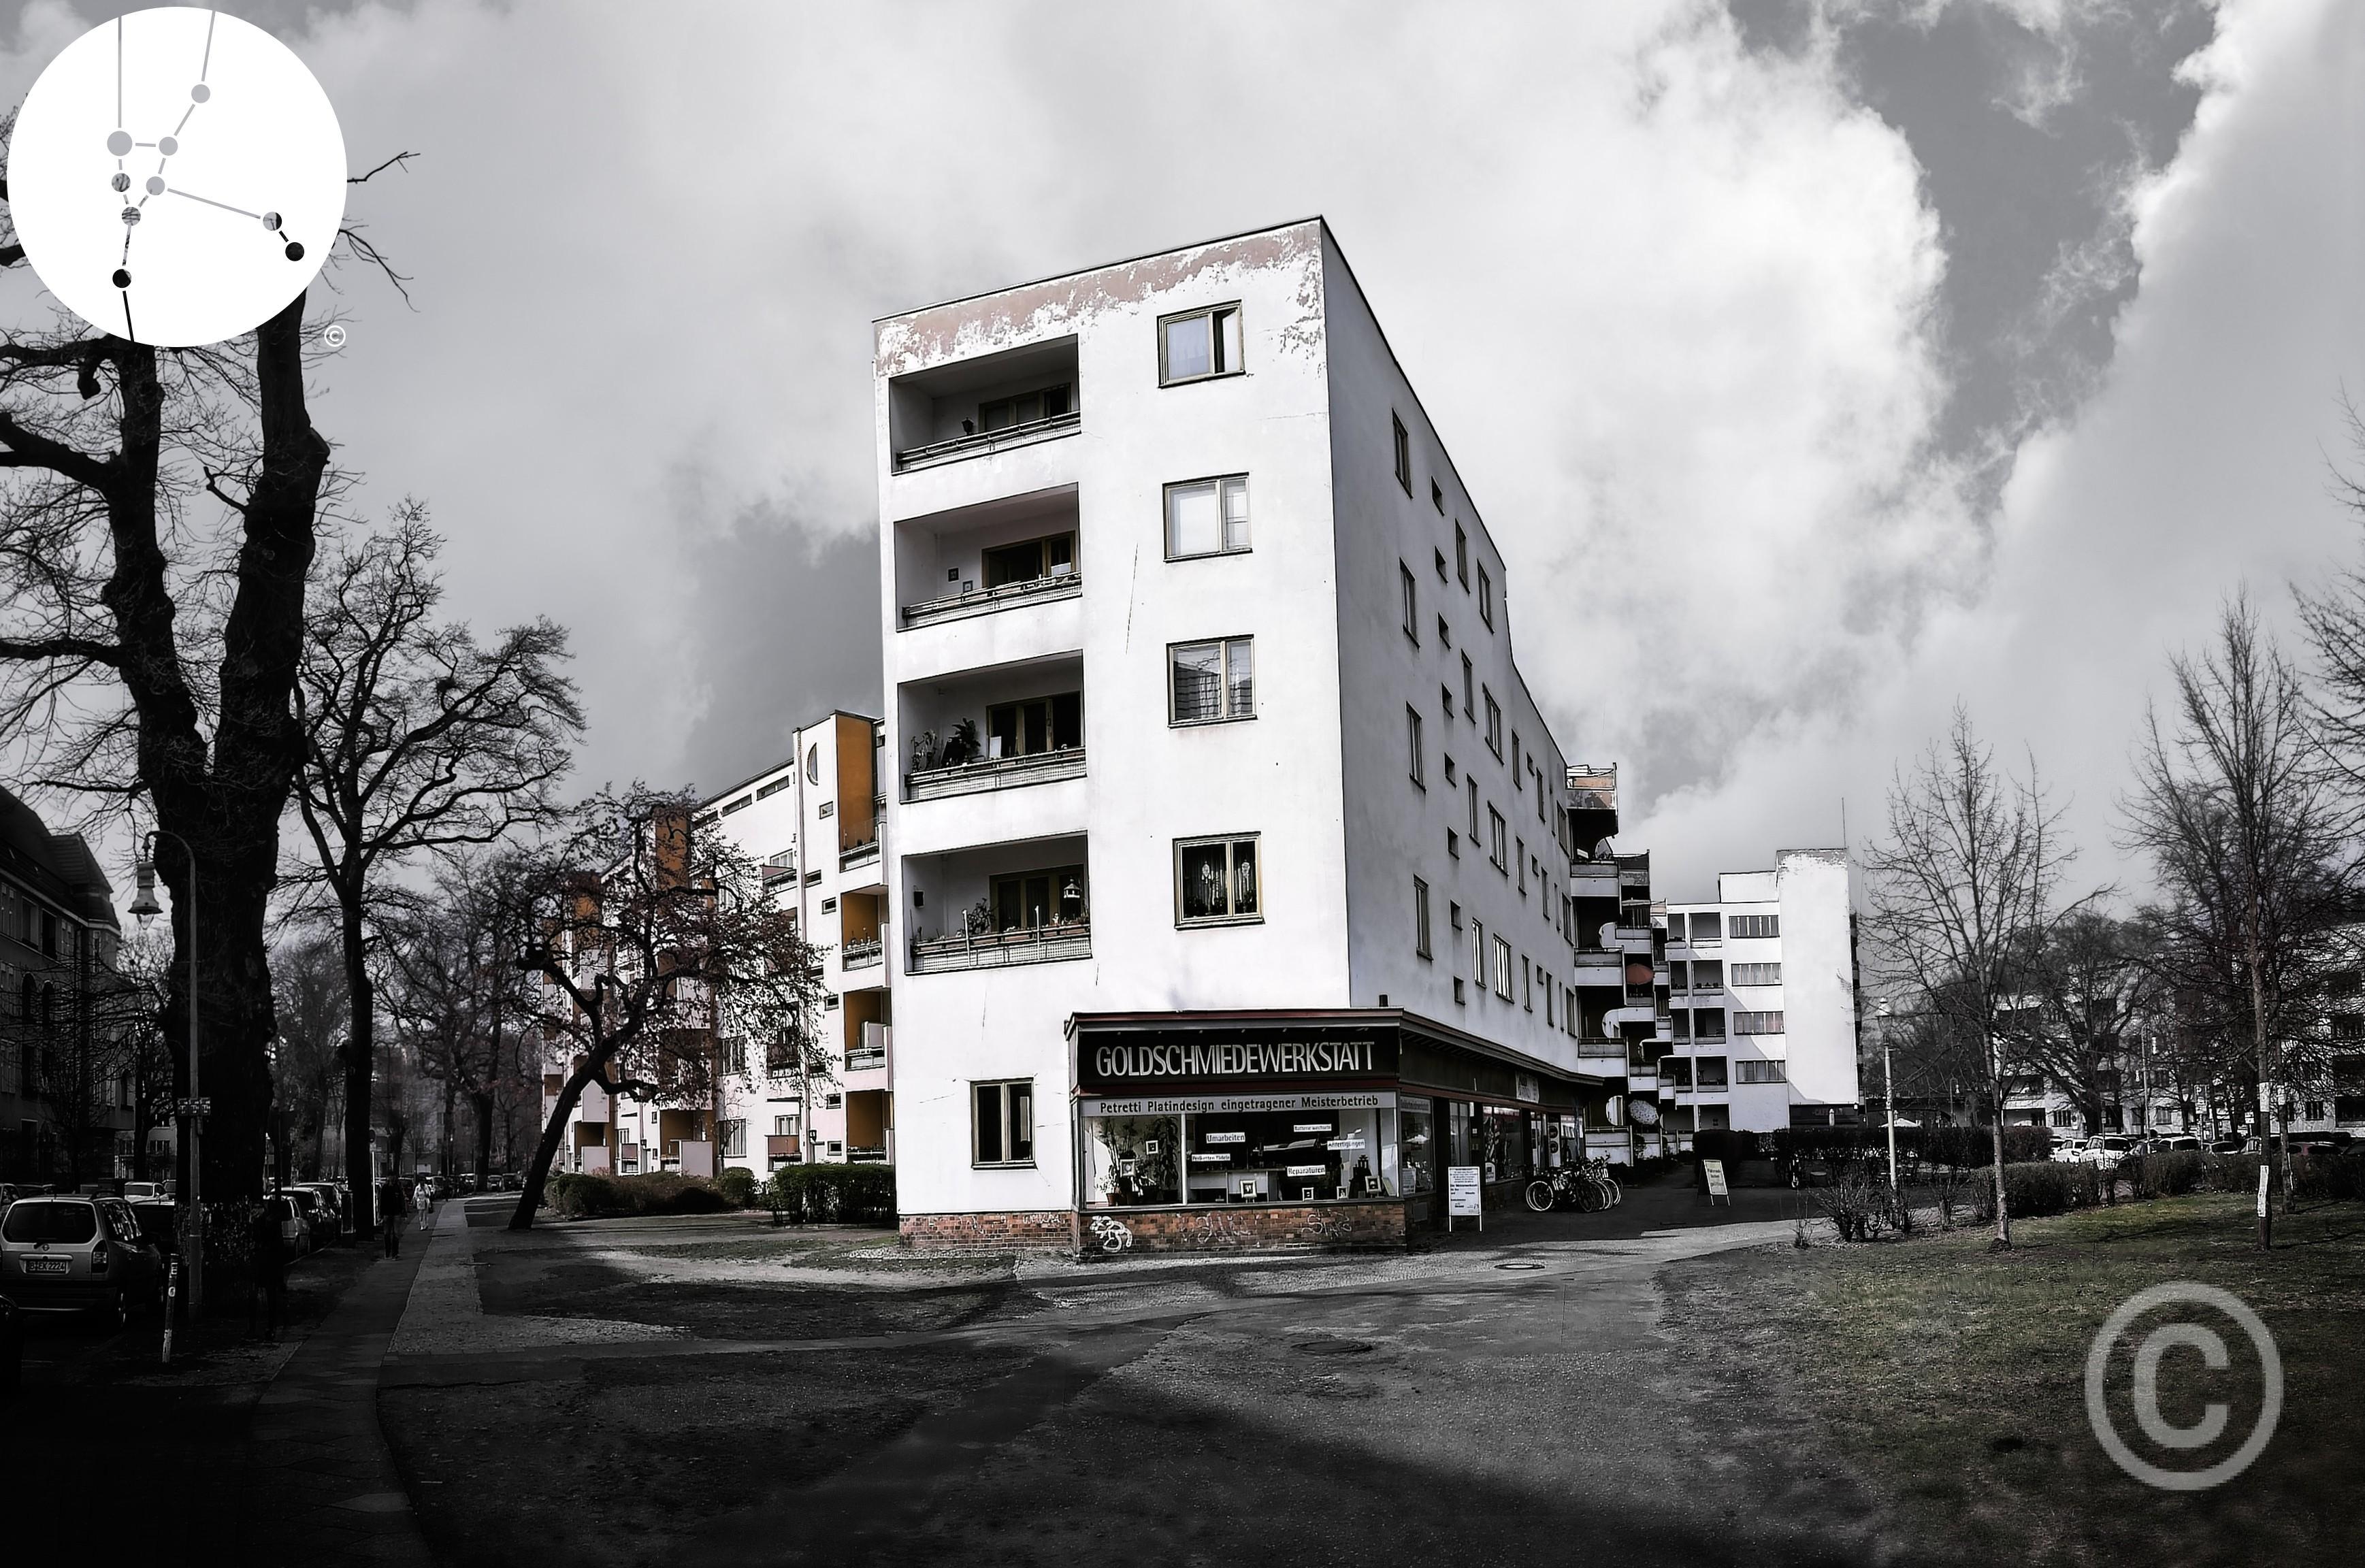 Berlin Modernism Housing Estates - The Ring - Siemensstadt Heritage Berlin Mackeritzstrasse Ensemble 1929-1931 © Prosper Jerominus 2018